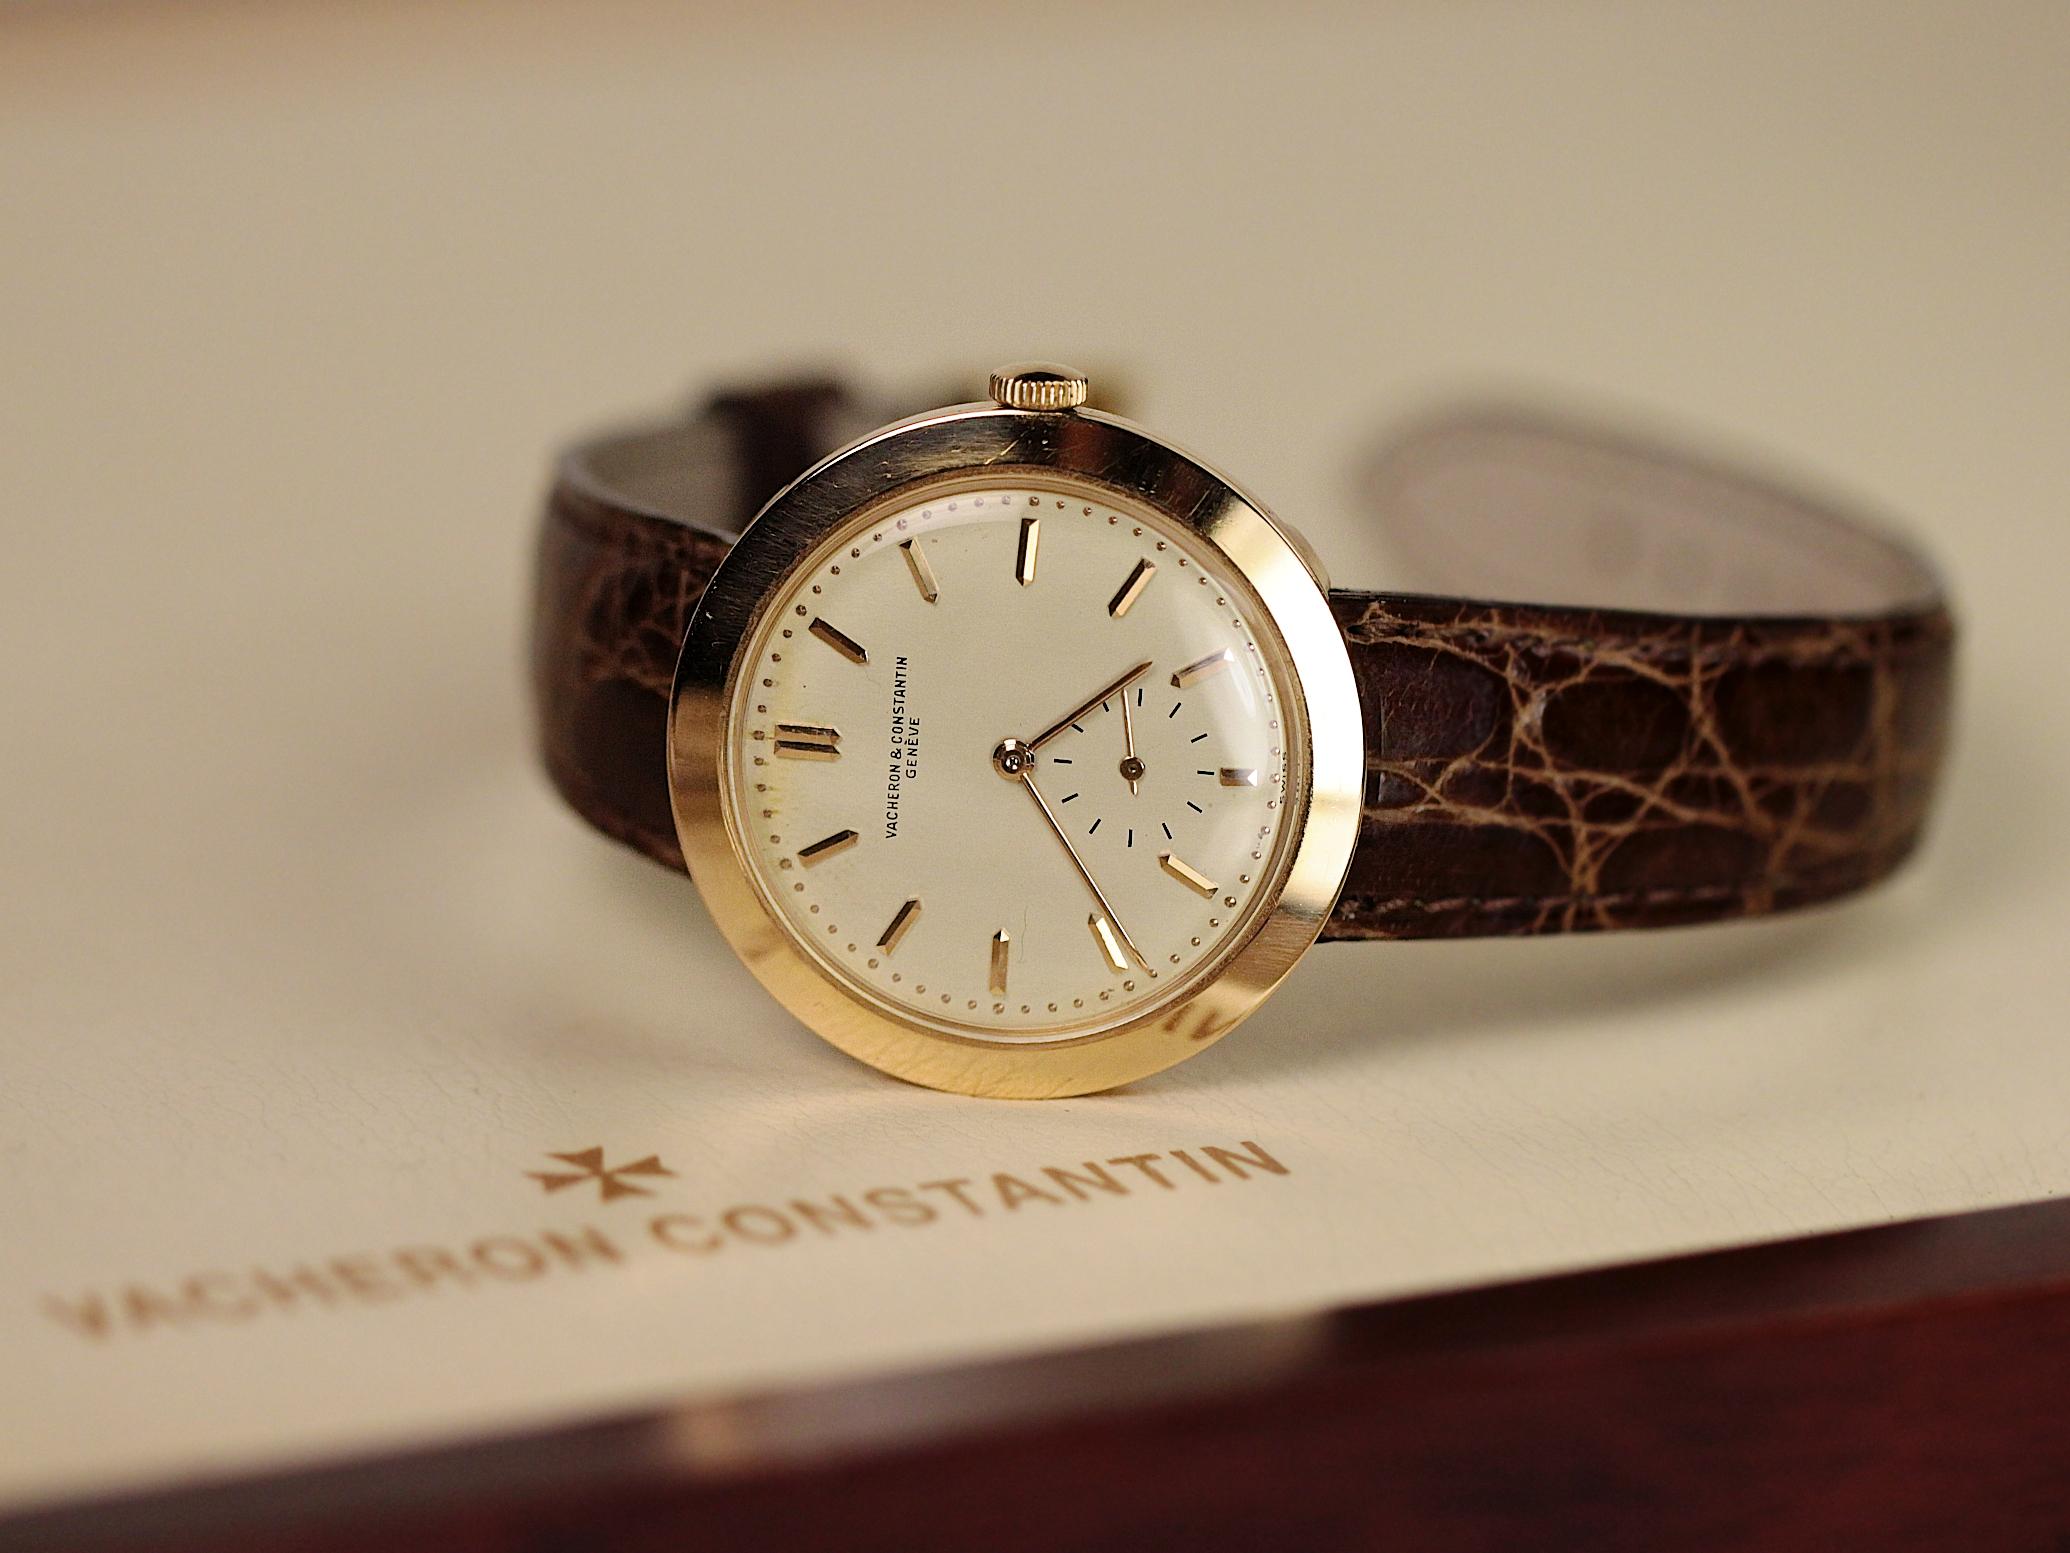 Vintage Watches For Sale >> Great Value Vintage Vacheron Constantin Watches For Sale Legend